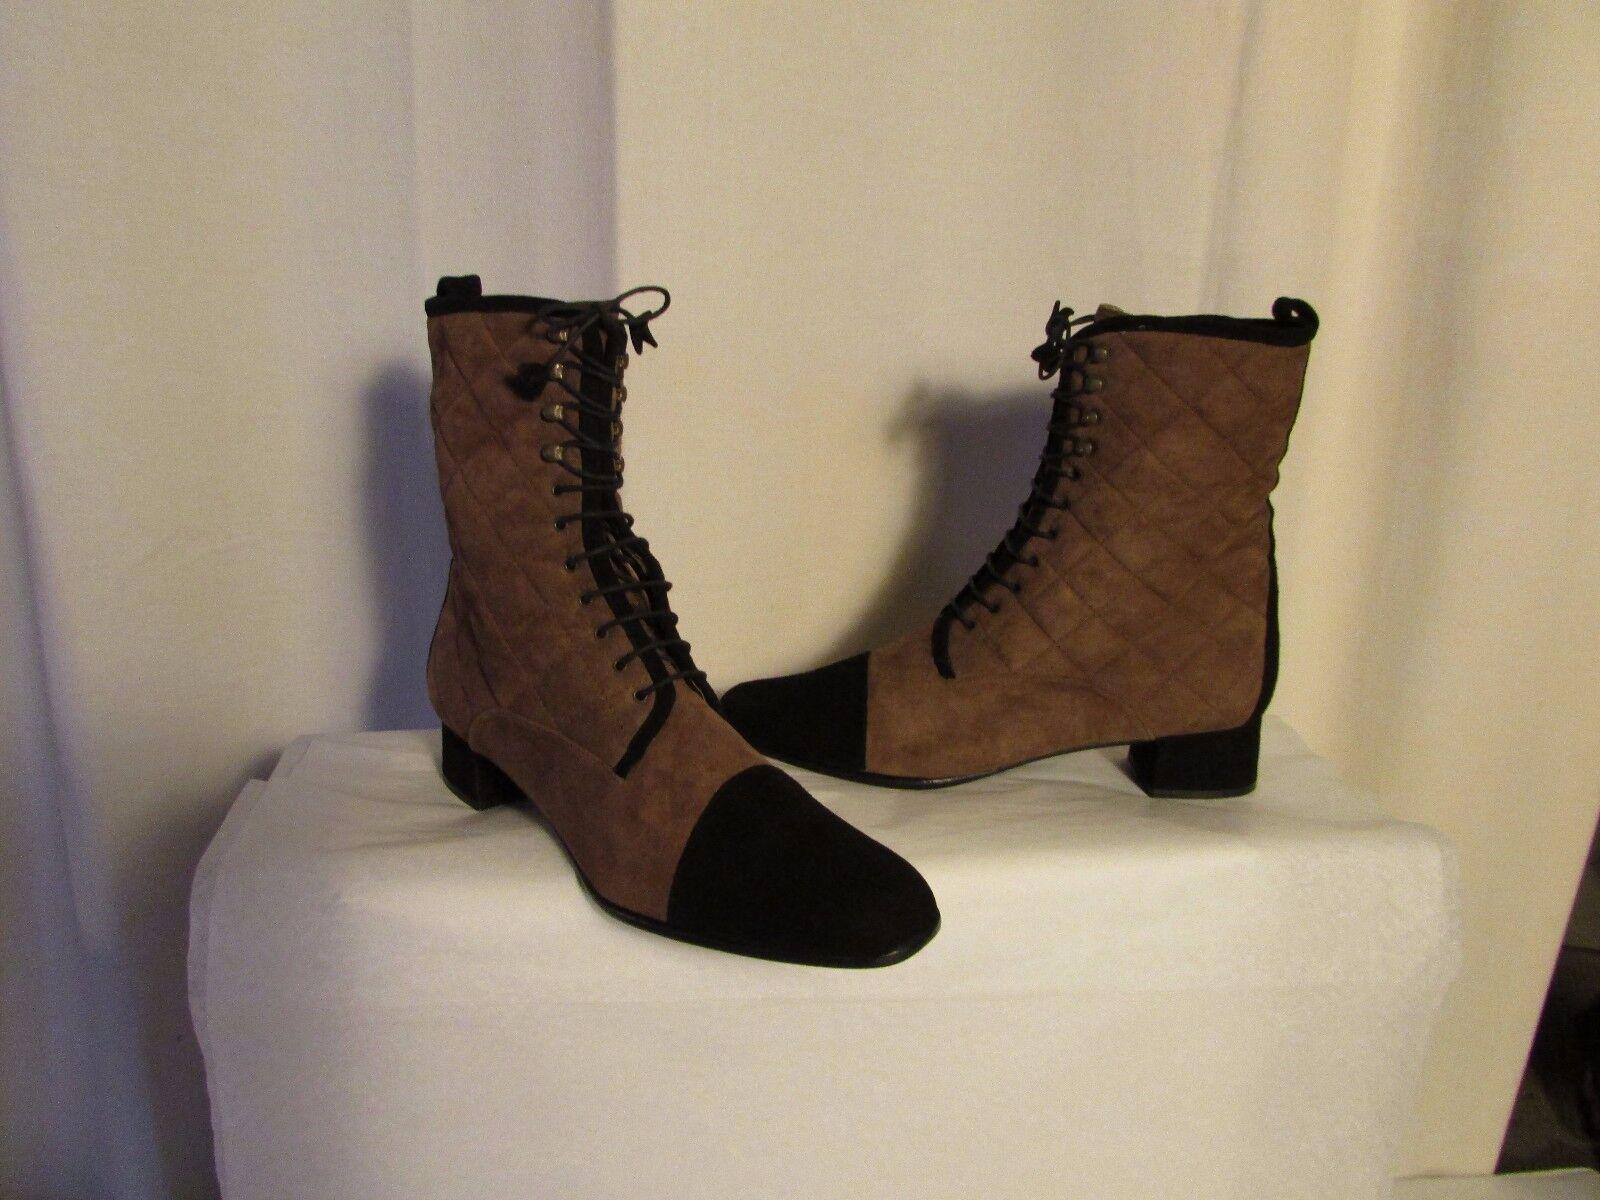 Zapatos casuales salvajes boots/bottines 40 LORIS AZZARO taupe/brun pointure 40 boots/bottines 6773b6